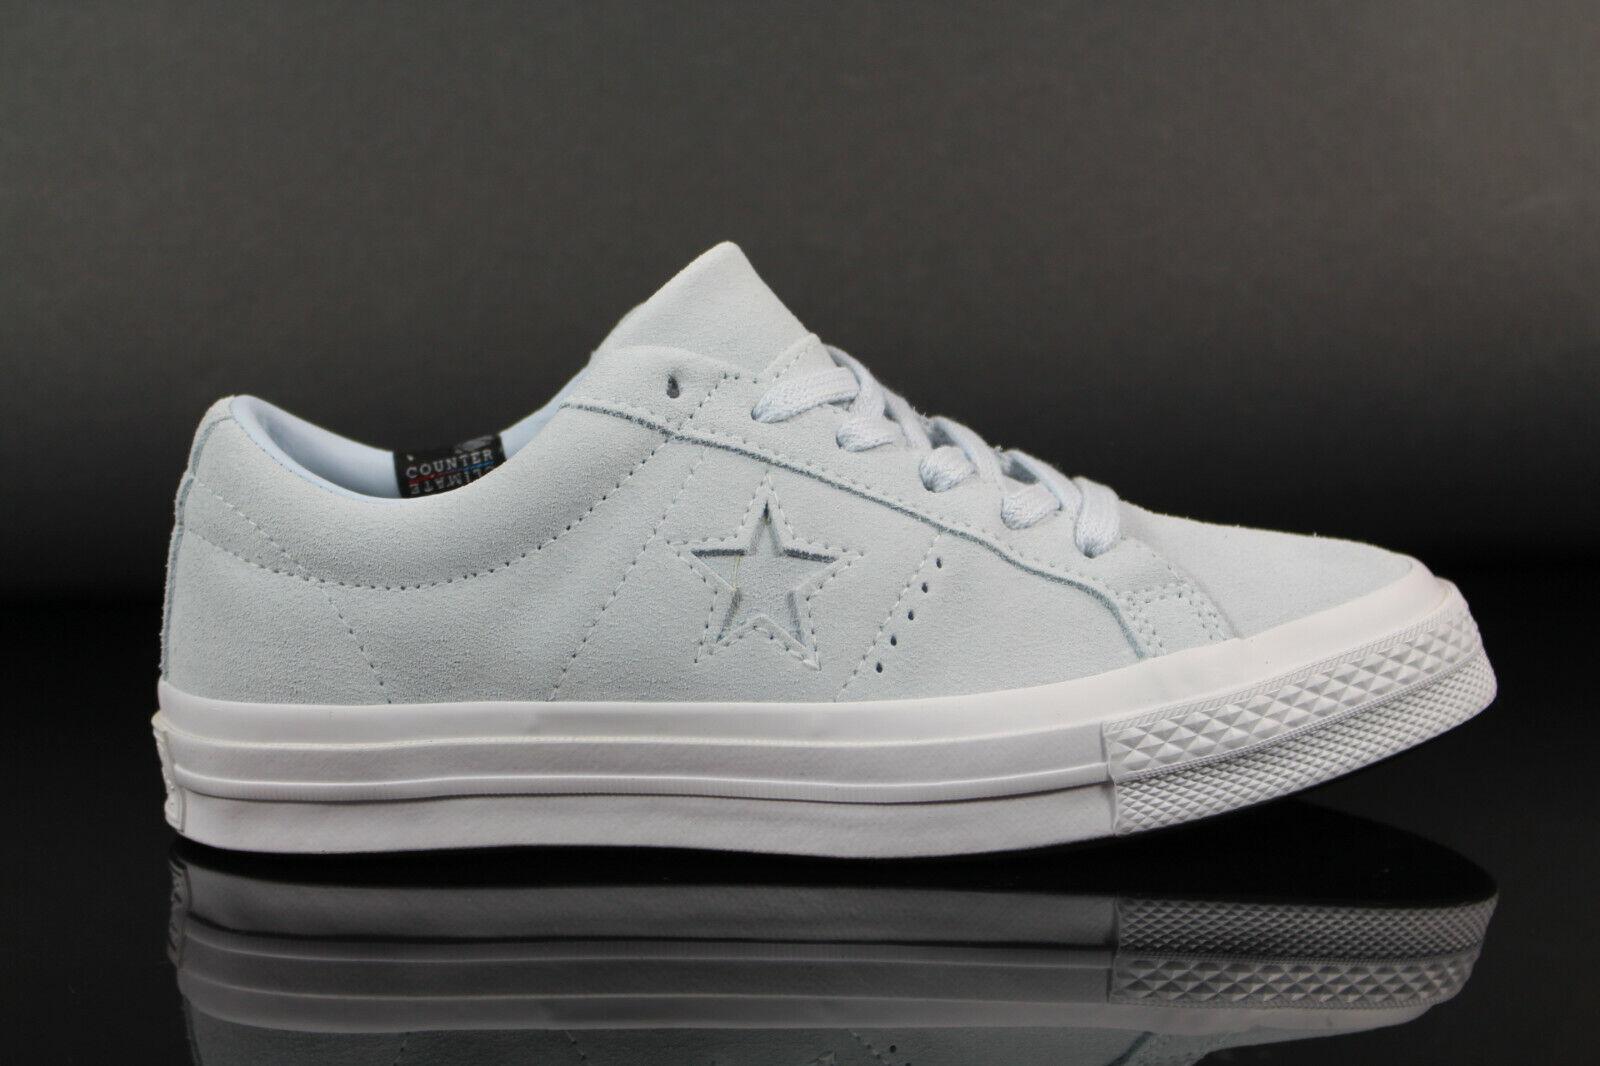 Neu Converse One Star OX Damen Turnschuhe Schuhe Sportschuhe Leder 158487C Freizeit